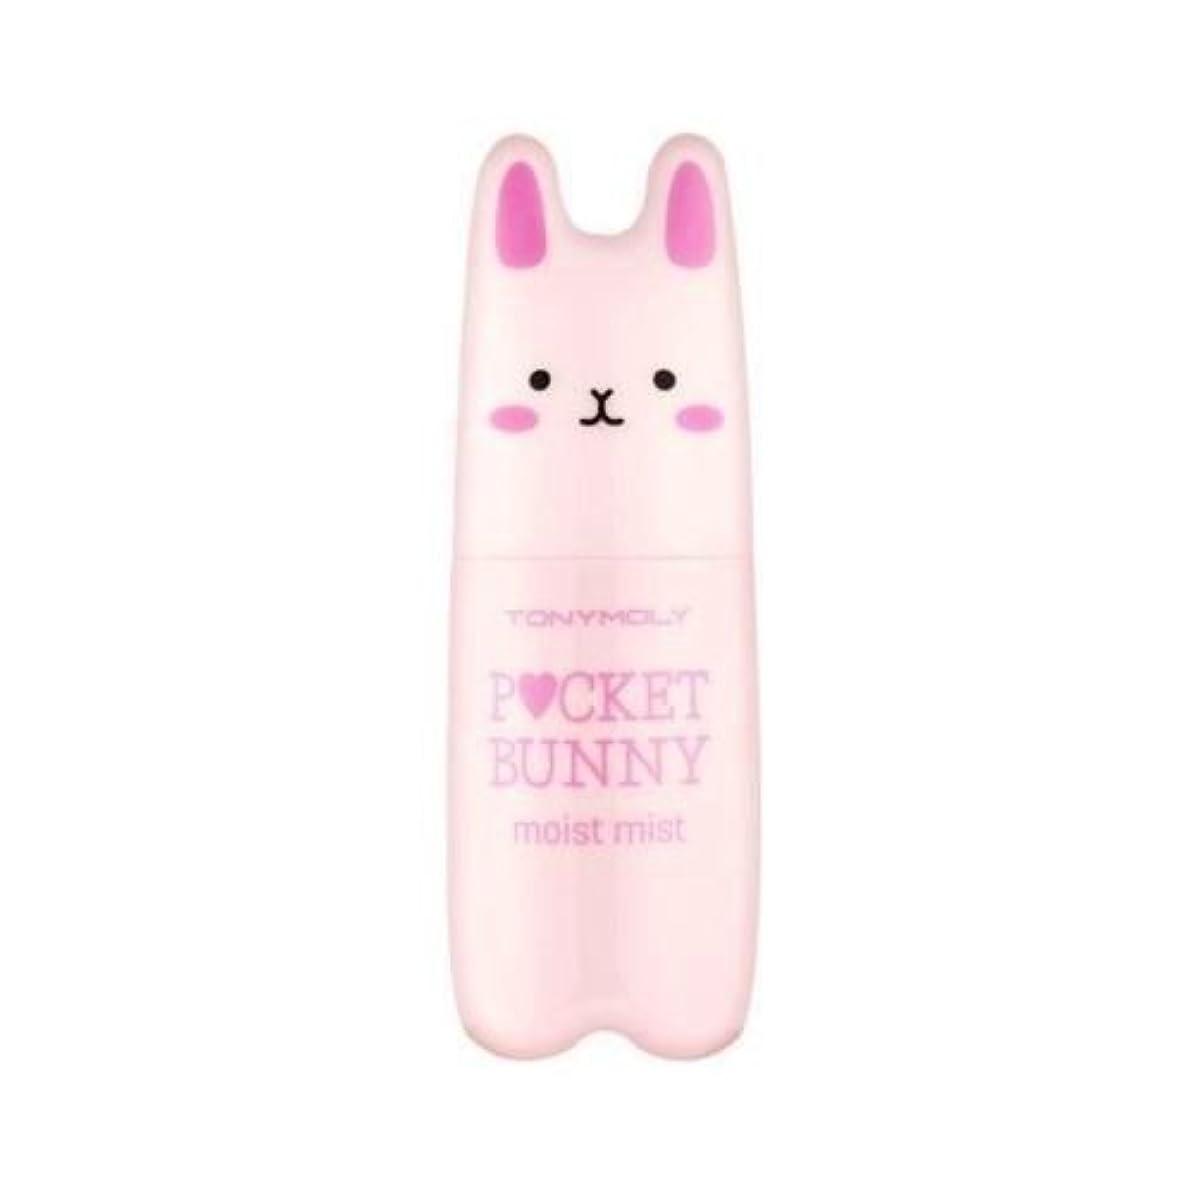 疑い者殉教者包囲(6 Pack) TONYMOLY Pocket Bunny Moist Mist (並行輸入品)